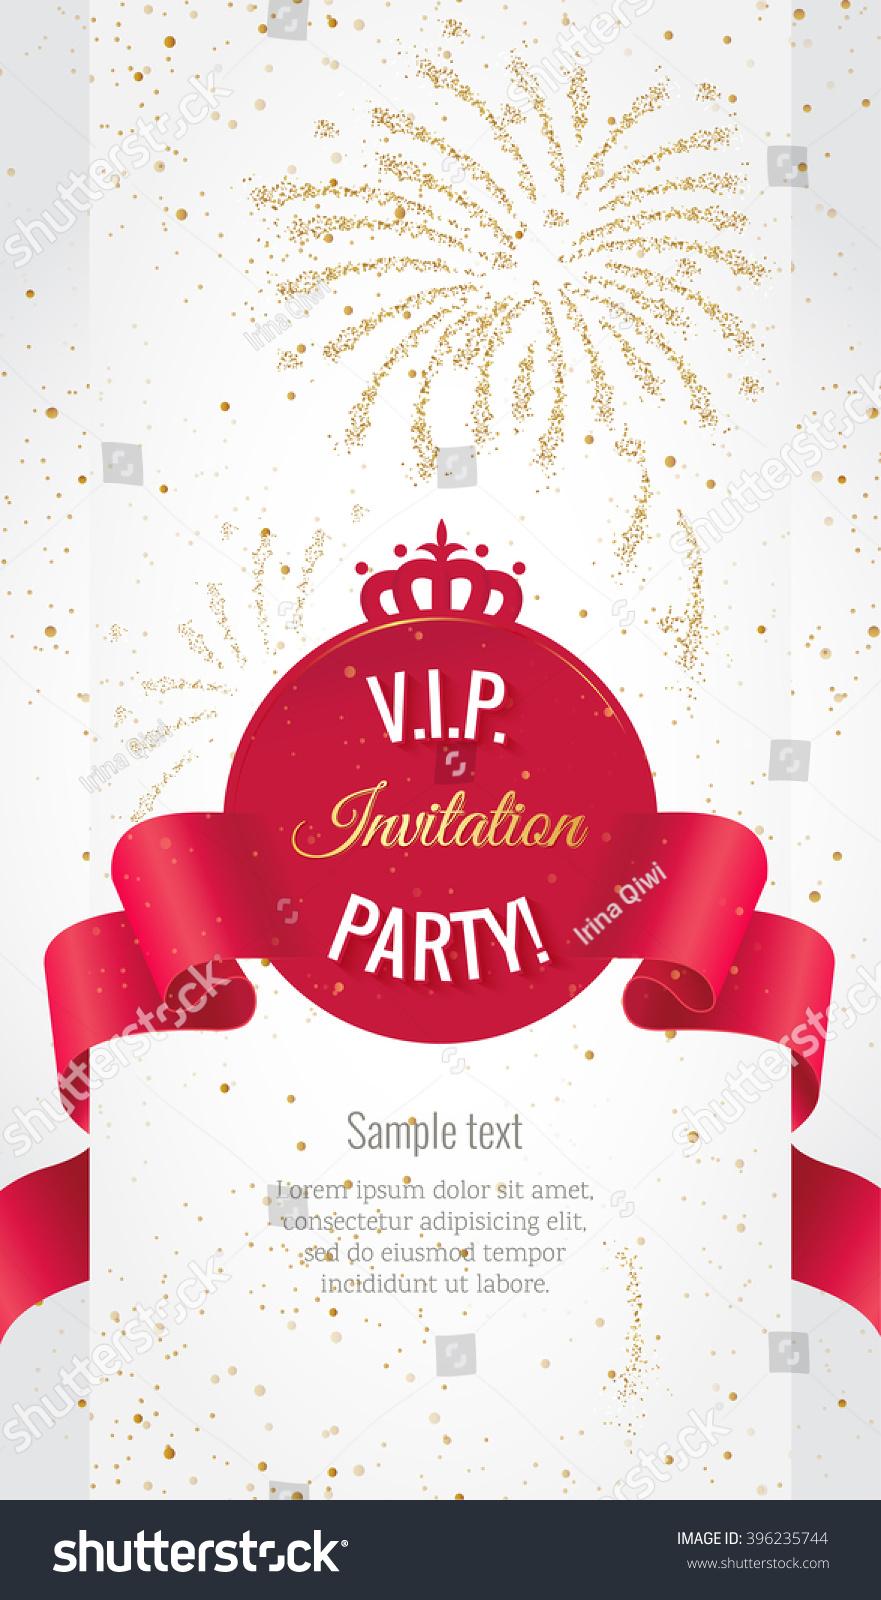 VIP Party Premium Invitation Card Poster Stock Vector 396235744 ...